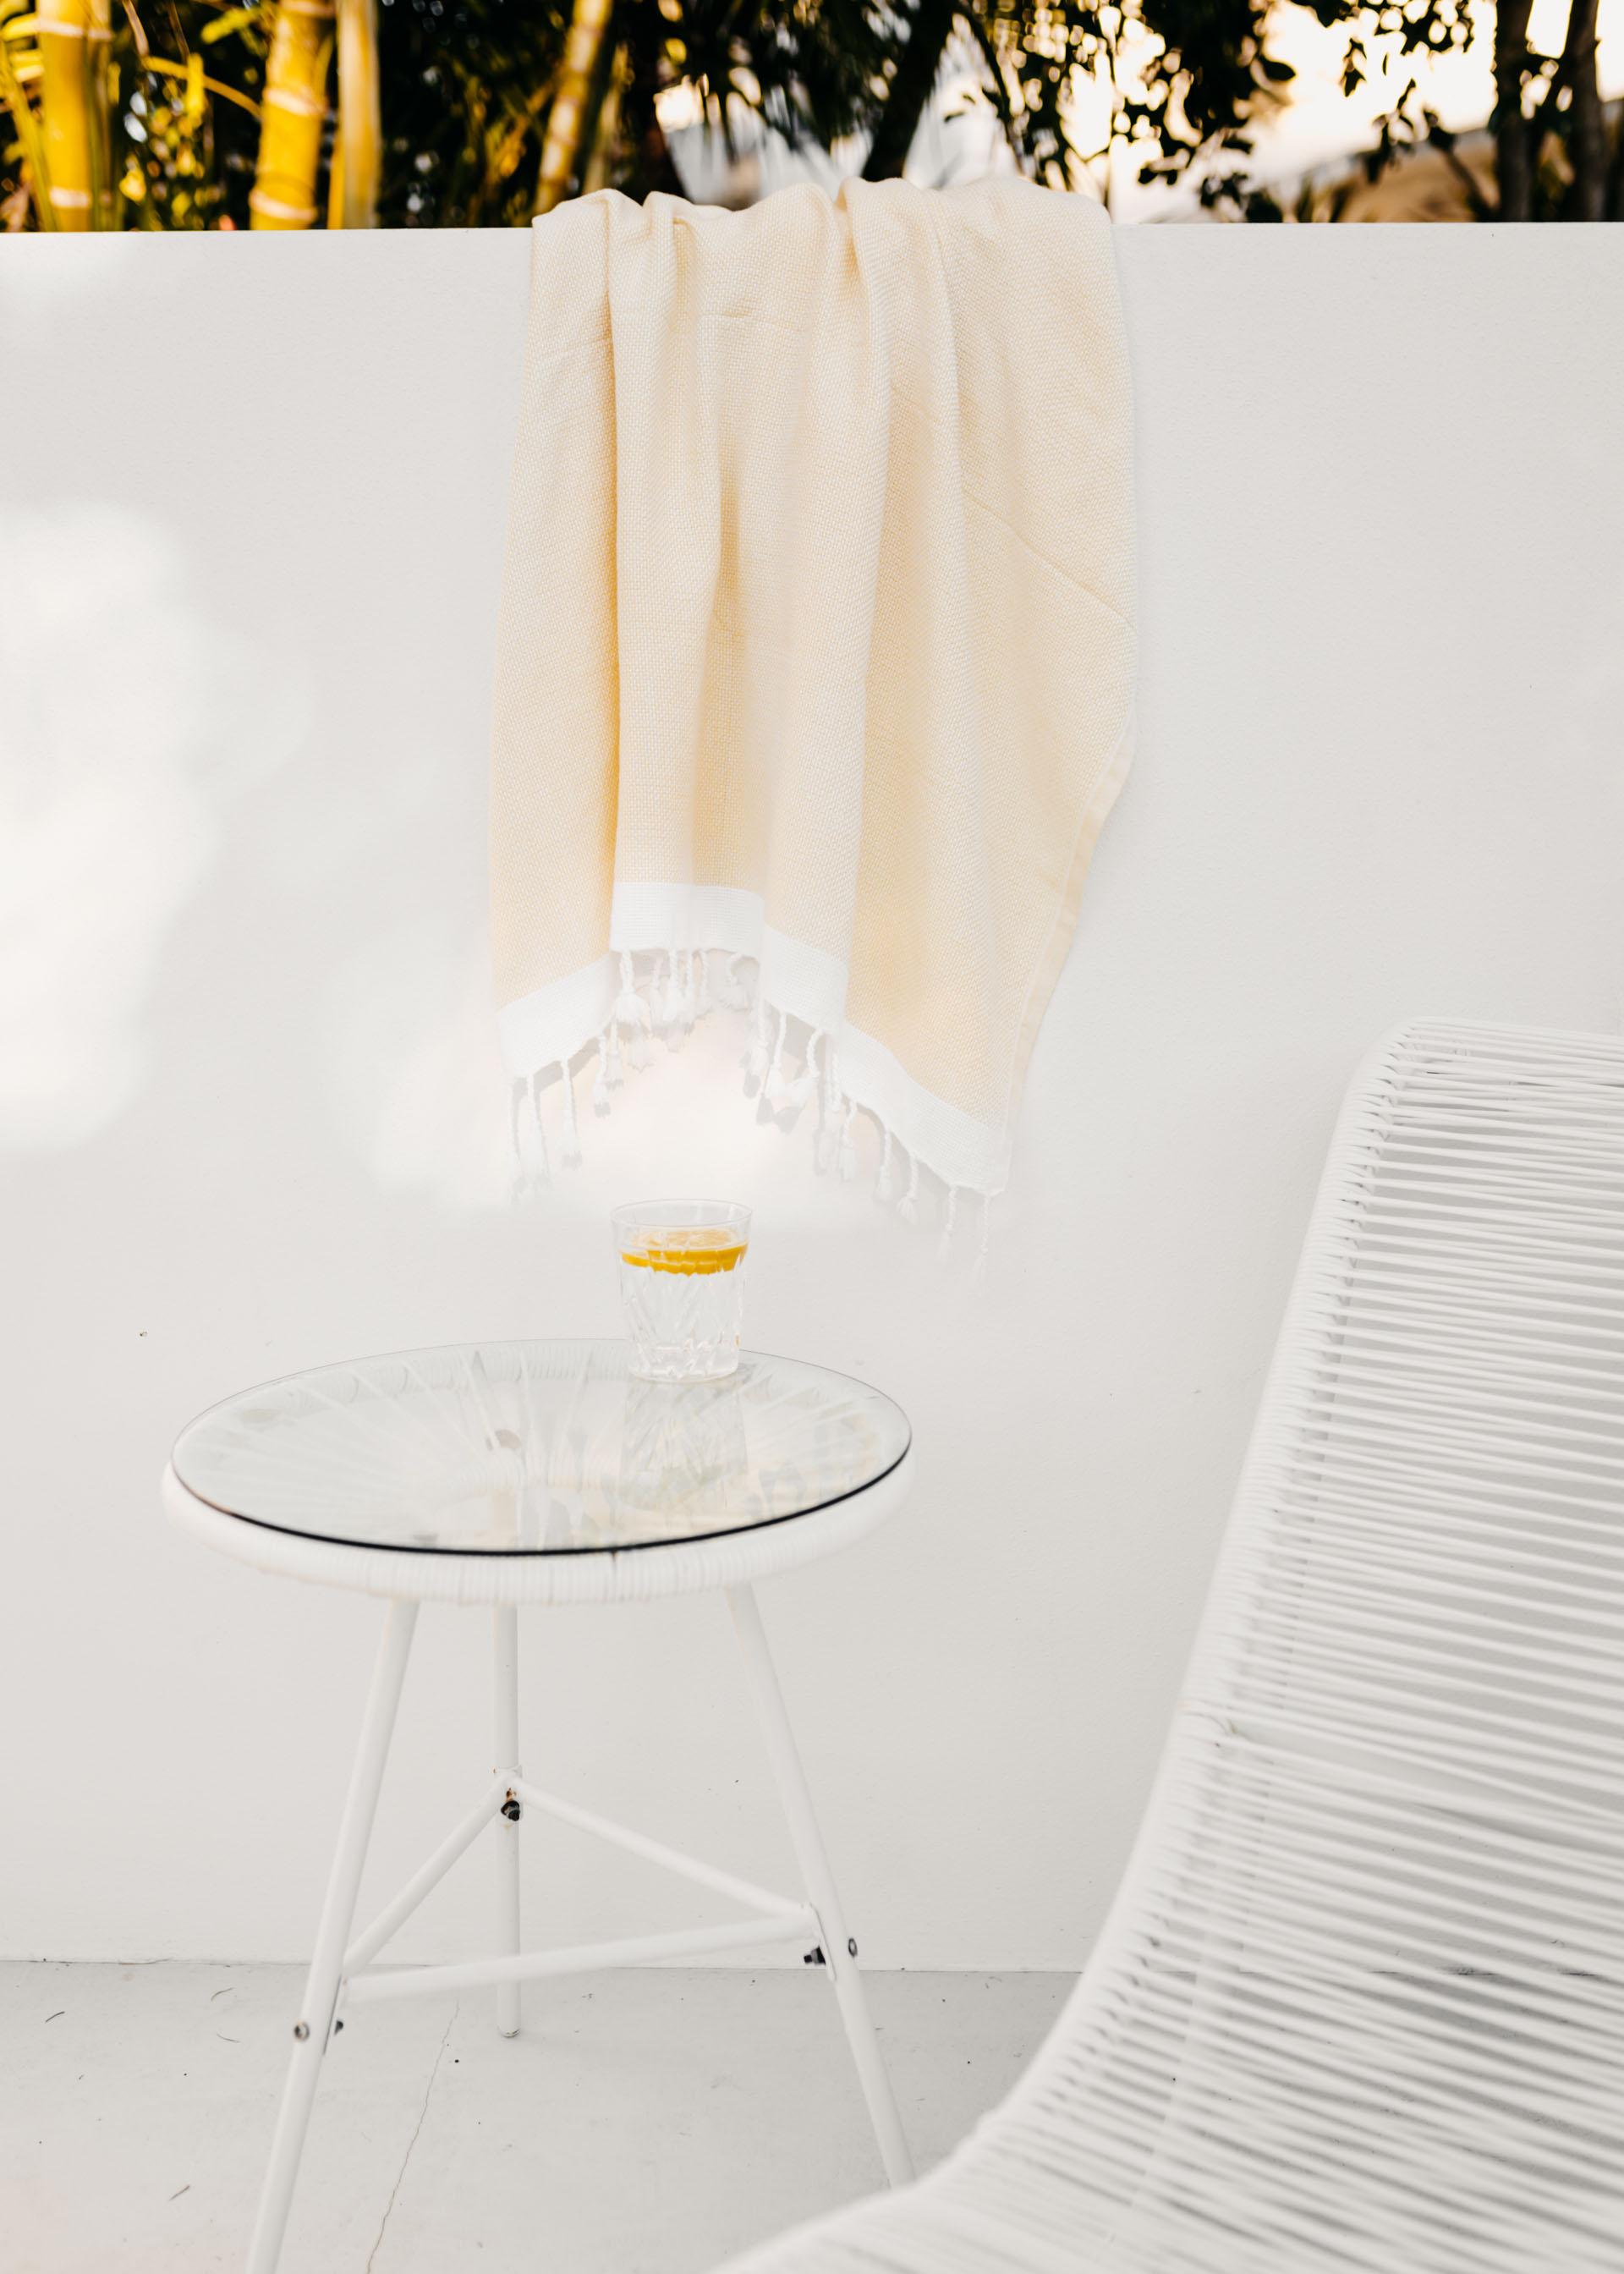 keira-mason-aegean-loom-turkish-towels-yellow-sun-chair.jpg